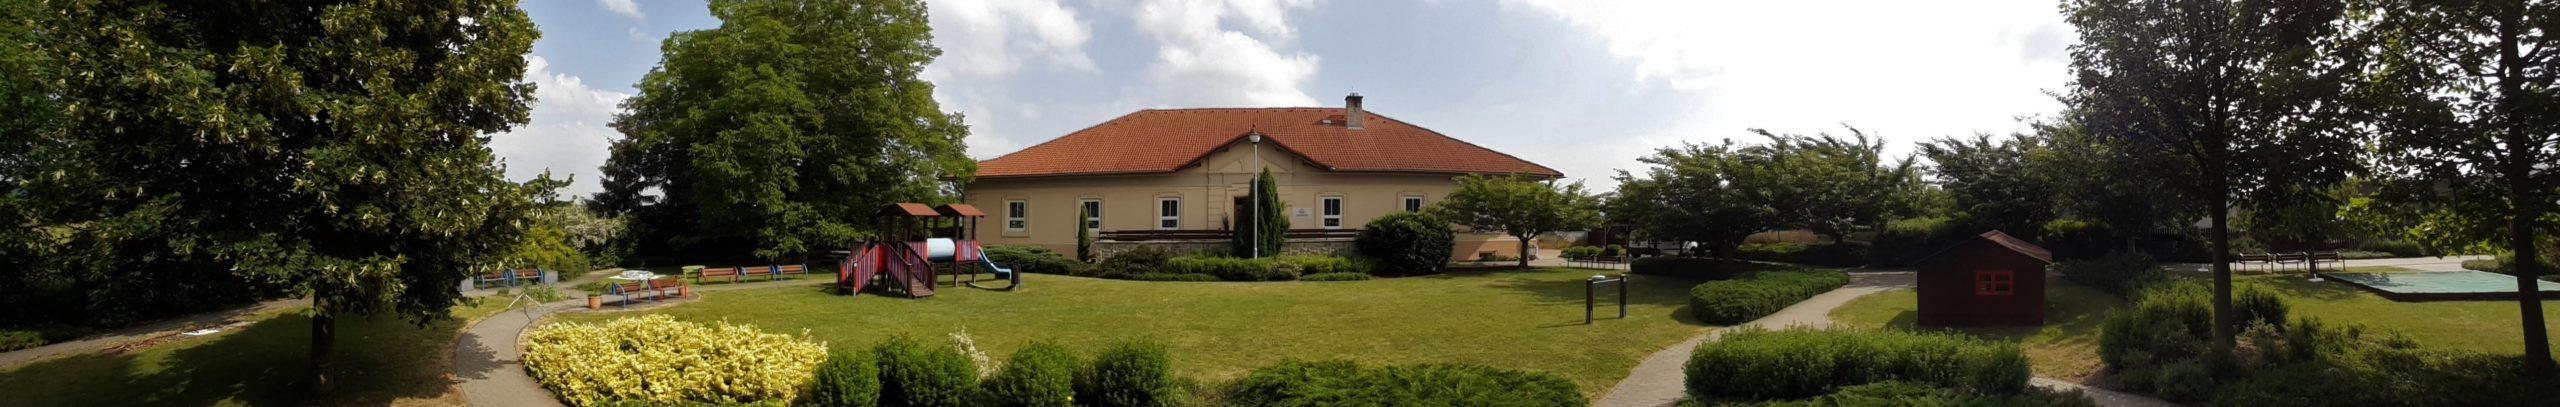 Hlavní budova MŠ Klubíčko Tlumačov